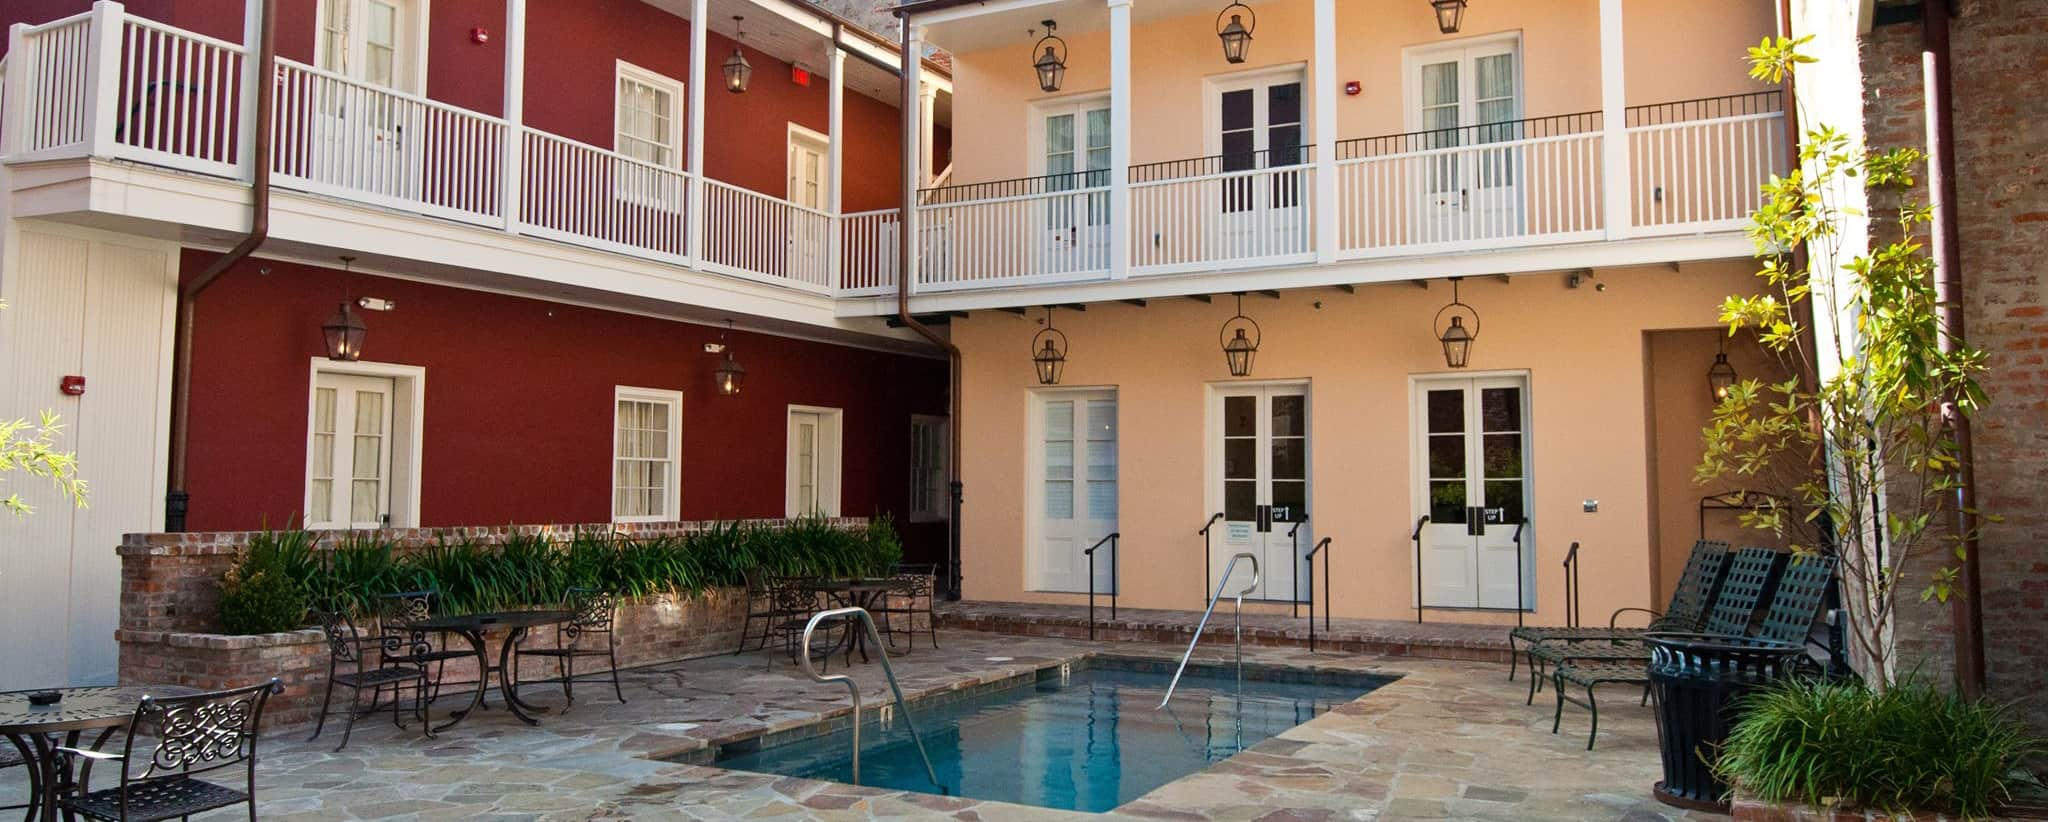 Best Hotels In French Quarter / French Market INN